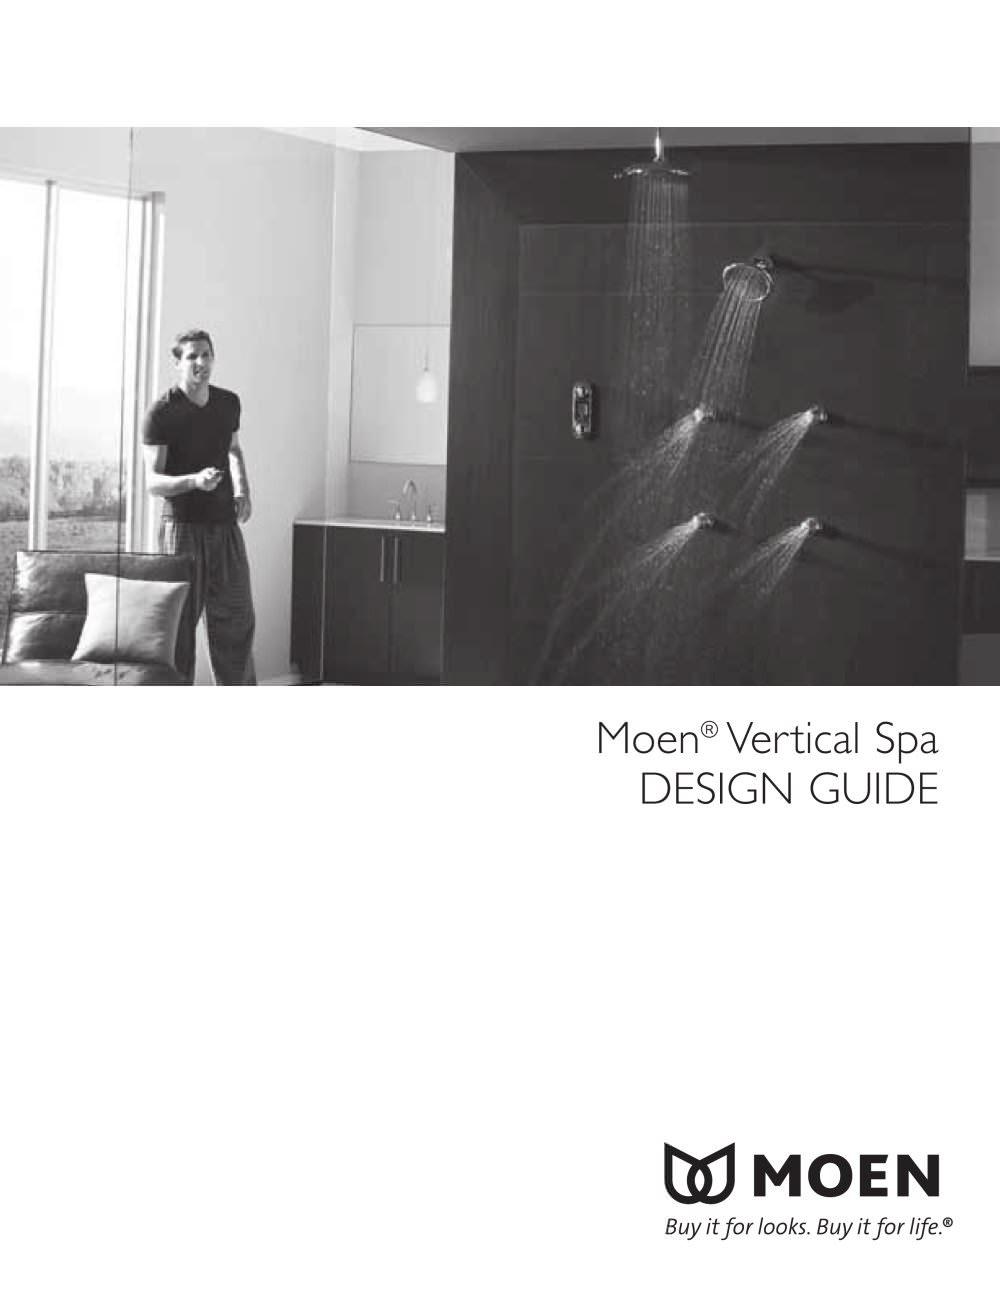 Moen Vertical Spa Design Guide Moen Pdf Catalogs